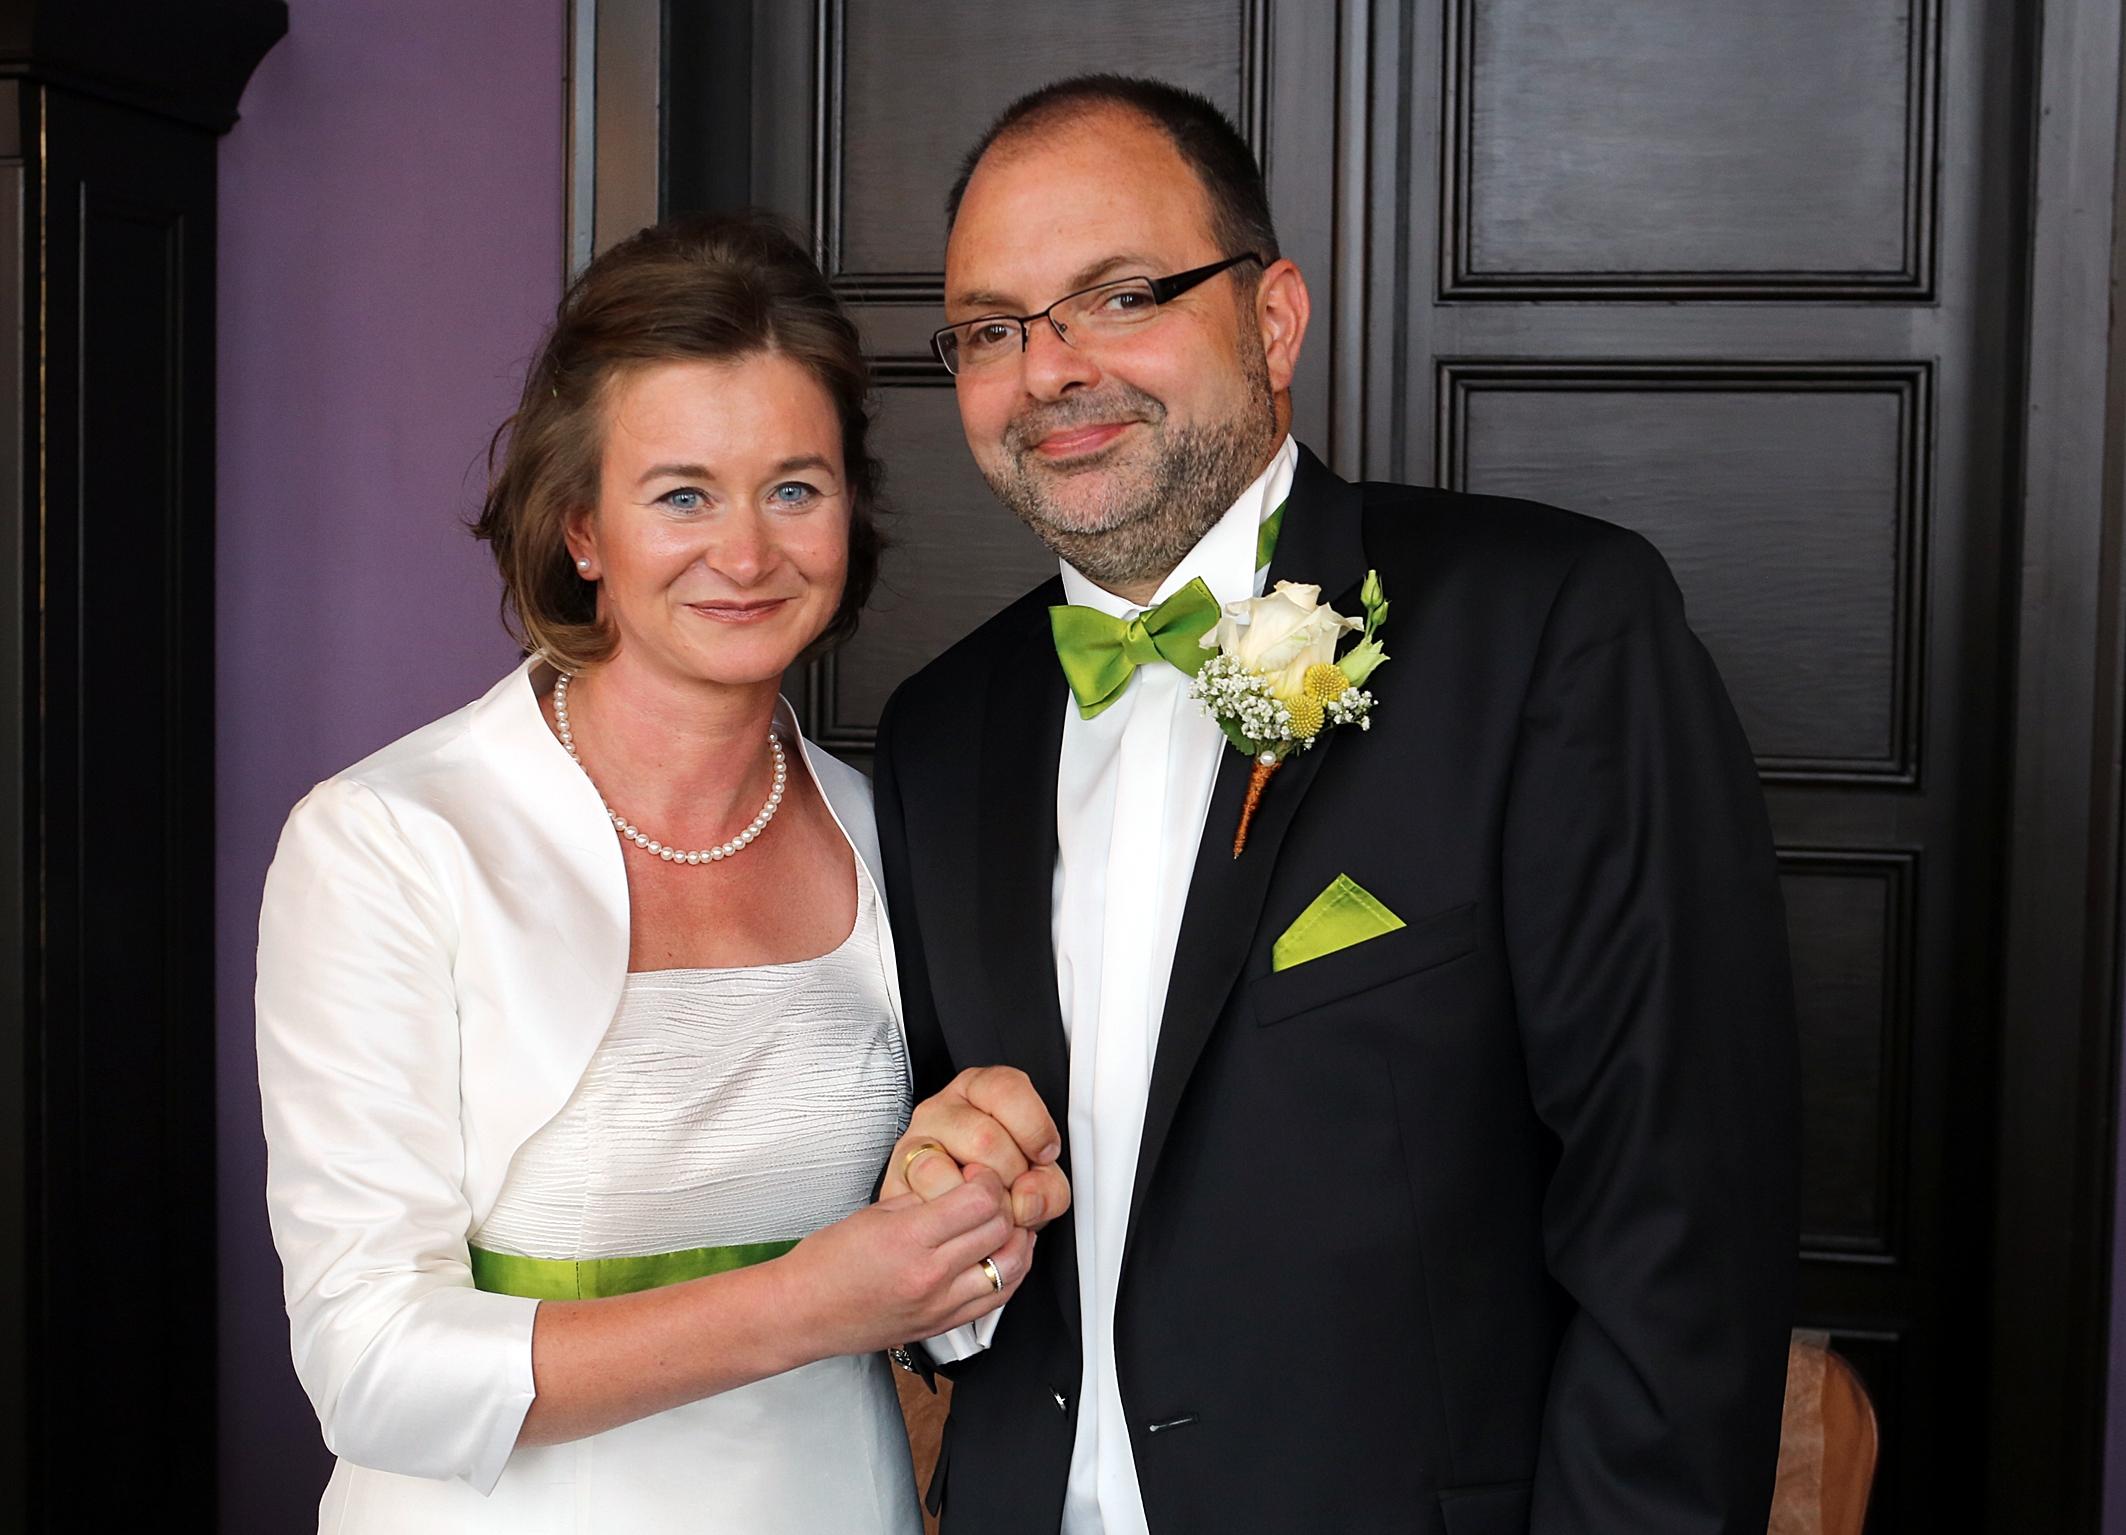 Brautkleid Fur Die Braut Ab 50 Noni